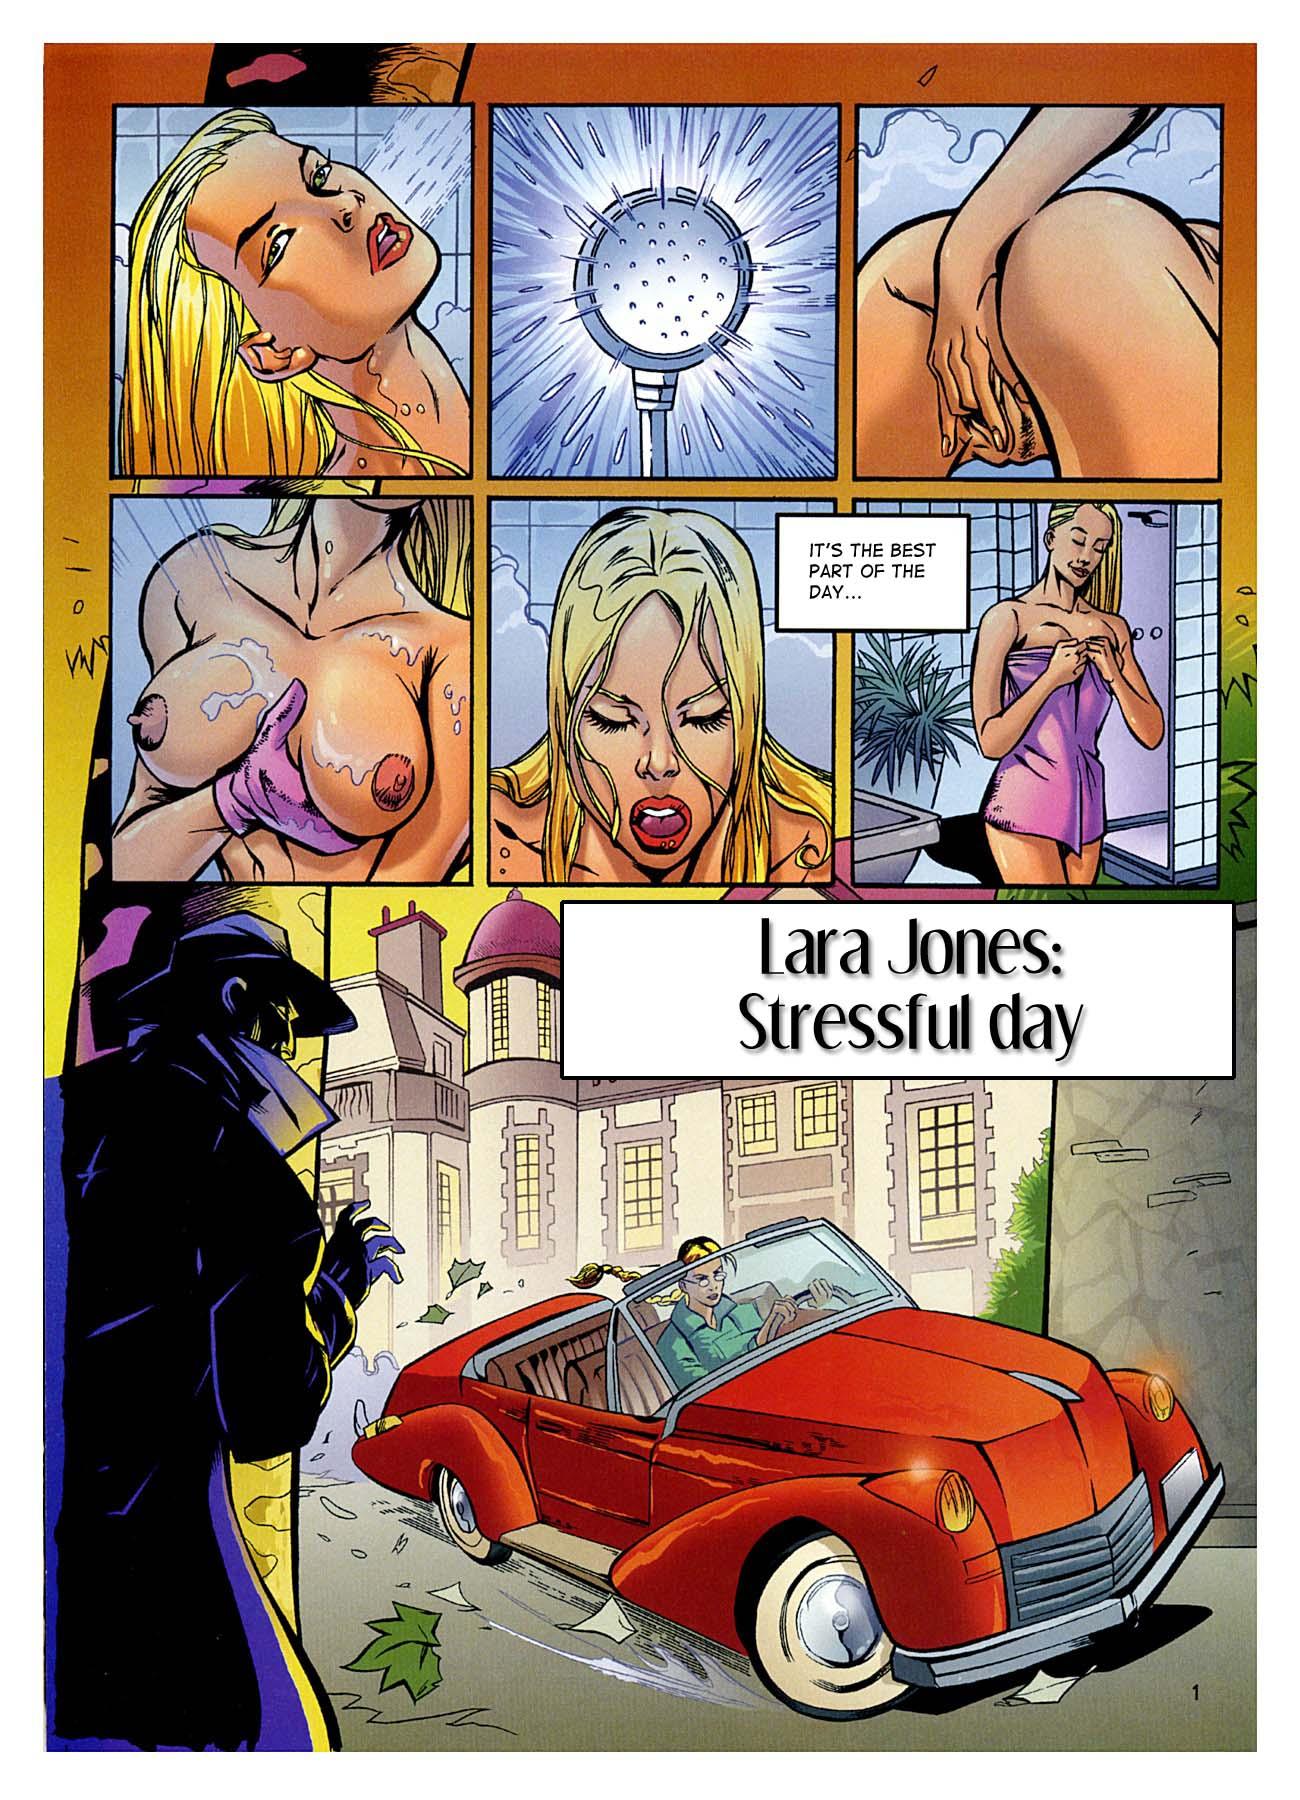 Porn Comics - Stressful Day- Lara Jones porn comics 8 muses